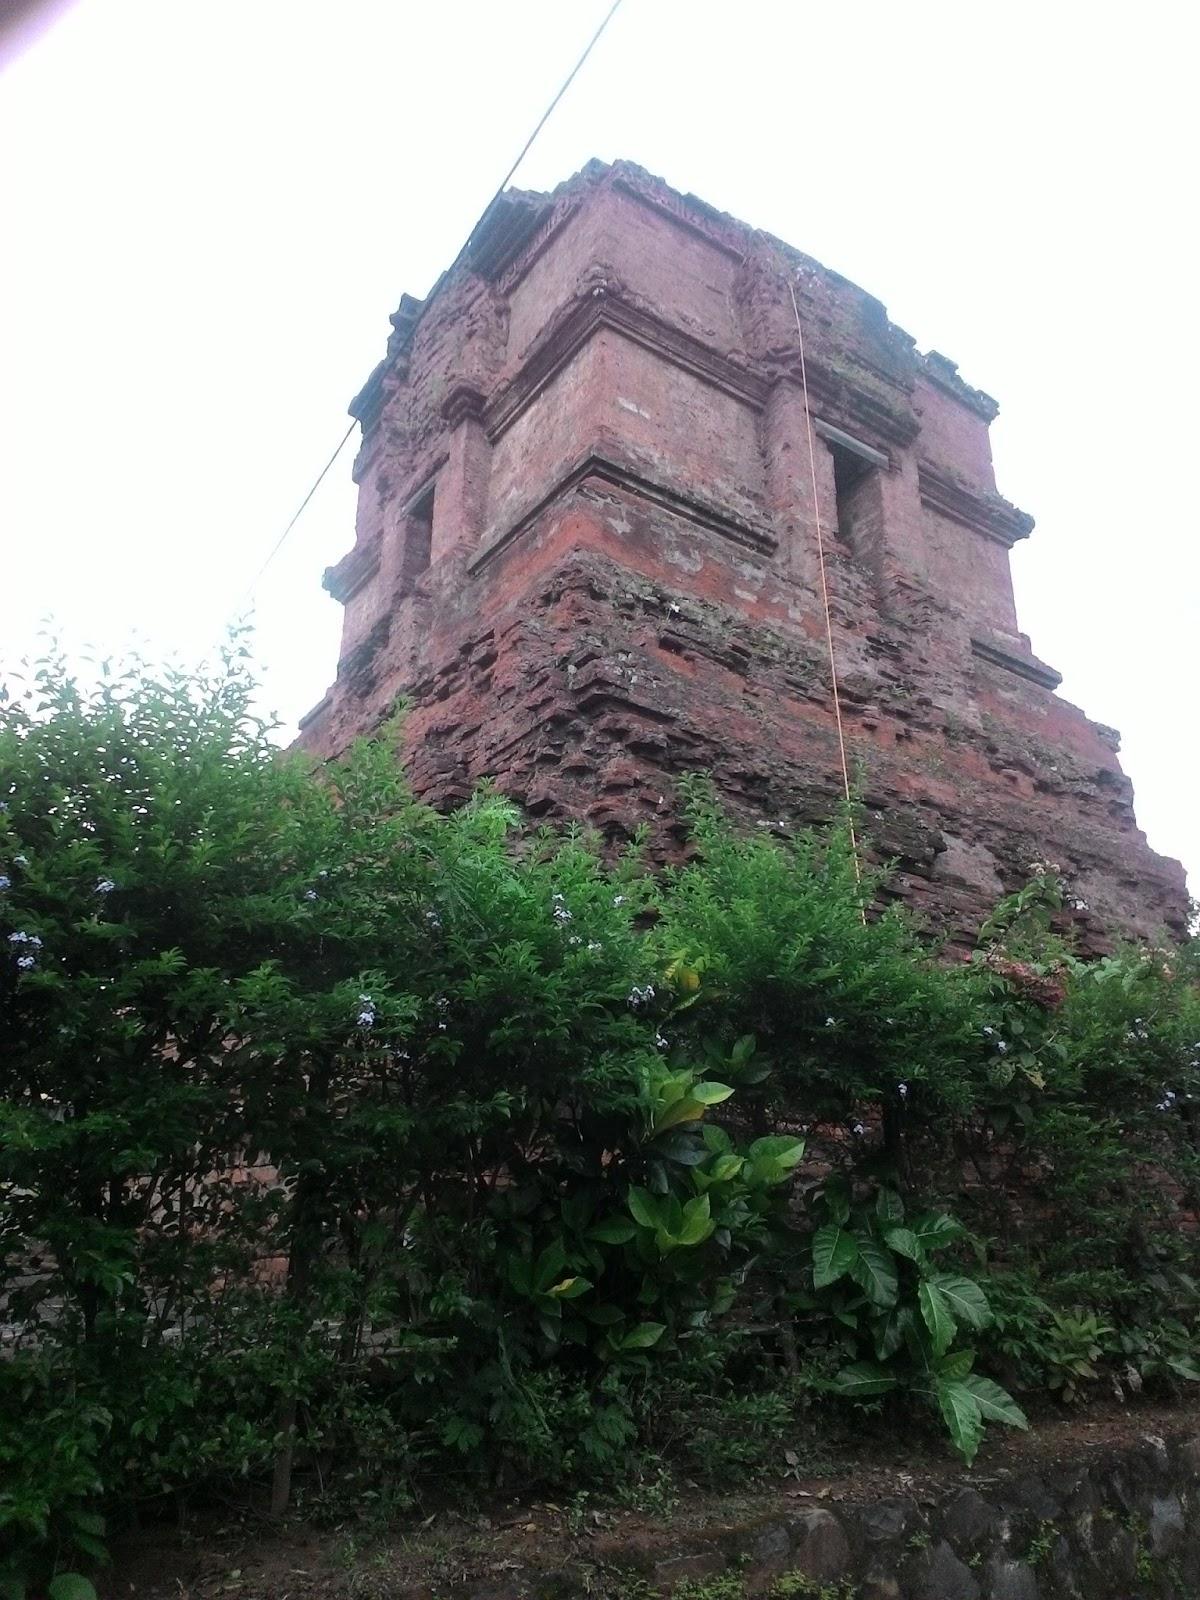 Sejarah Peristiwa Candi Ngetos Nganjuk Terletak Desa Kecamatan Ngeos Sekitar